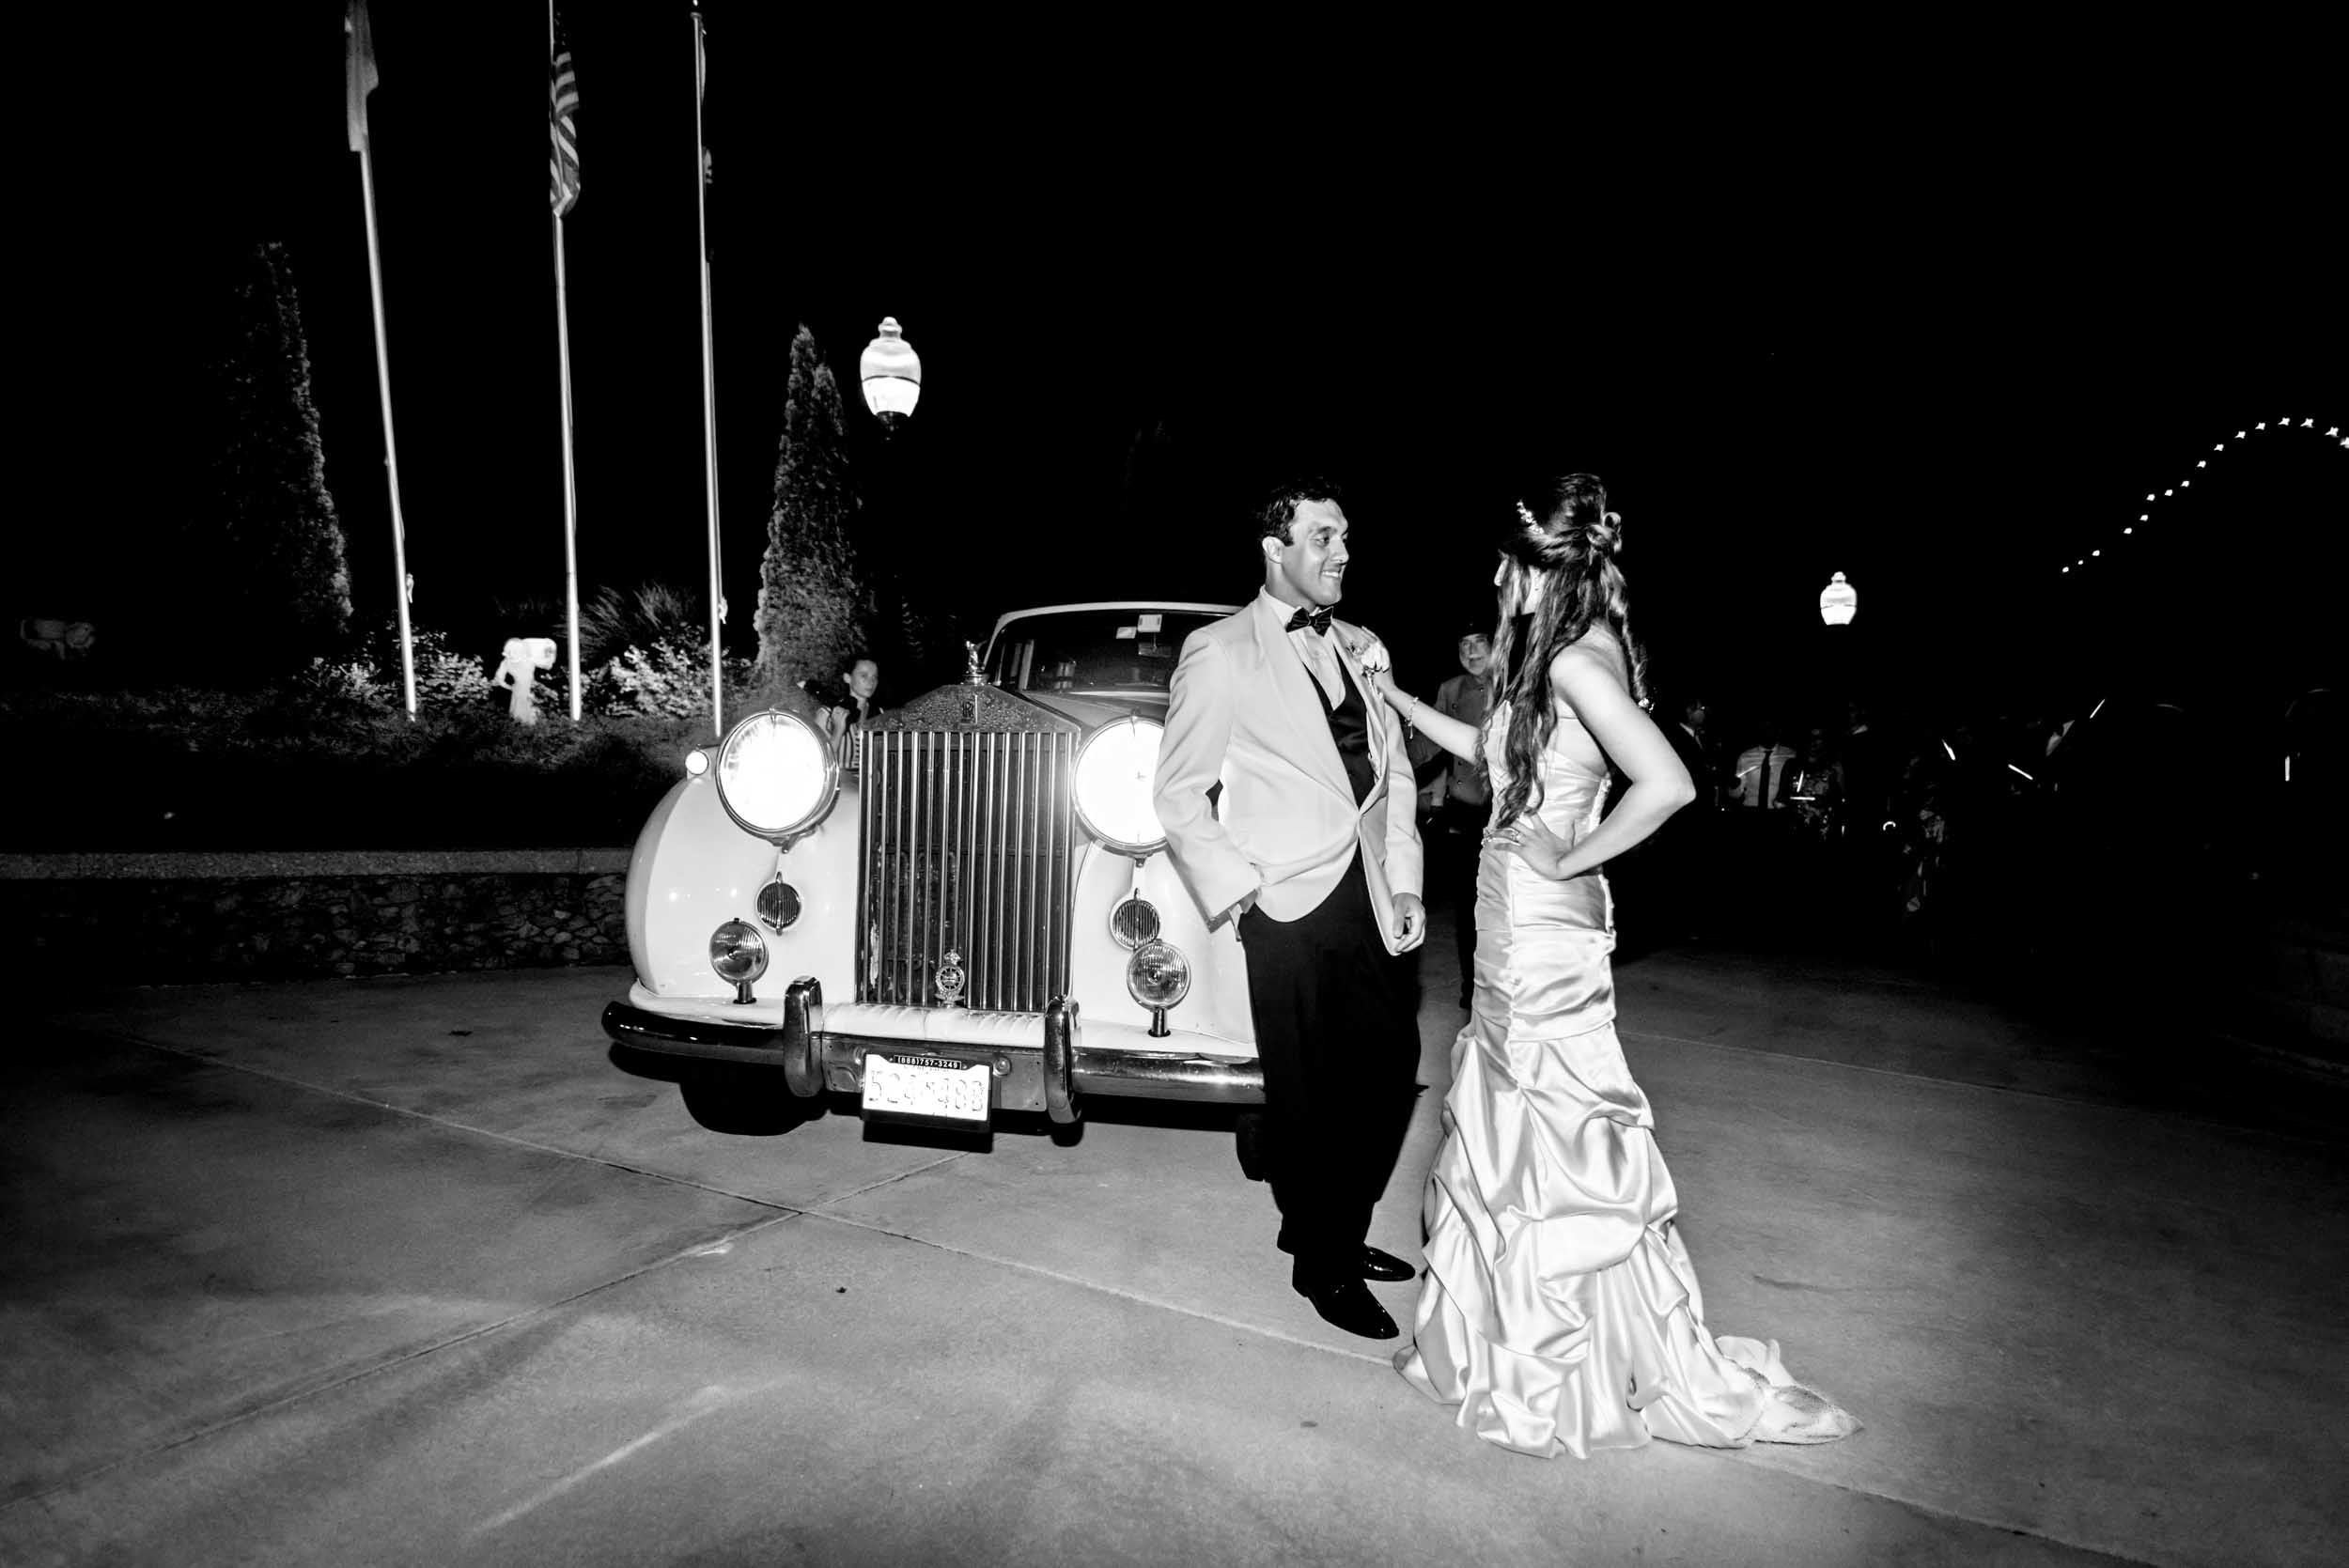 dc+metro+wedding+photographer+vadym+guliuk+photography+wedding+bride+and+groom-2044.jpg